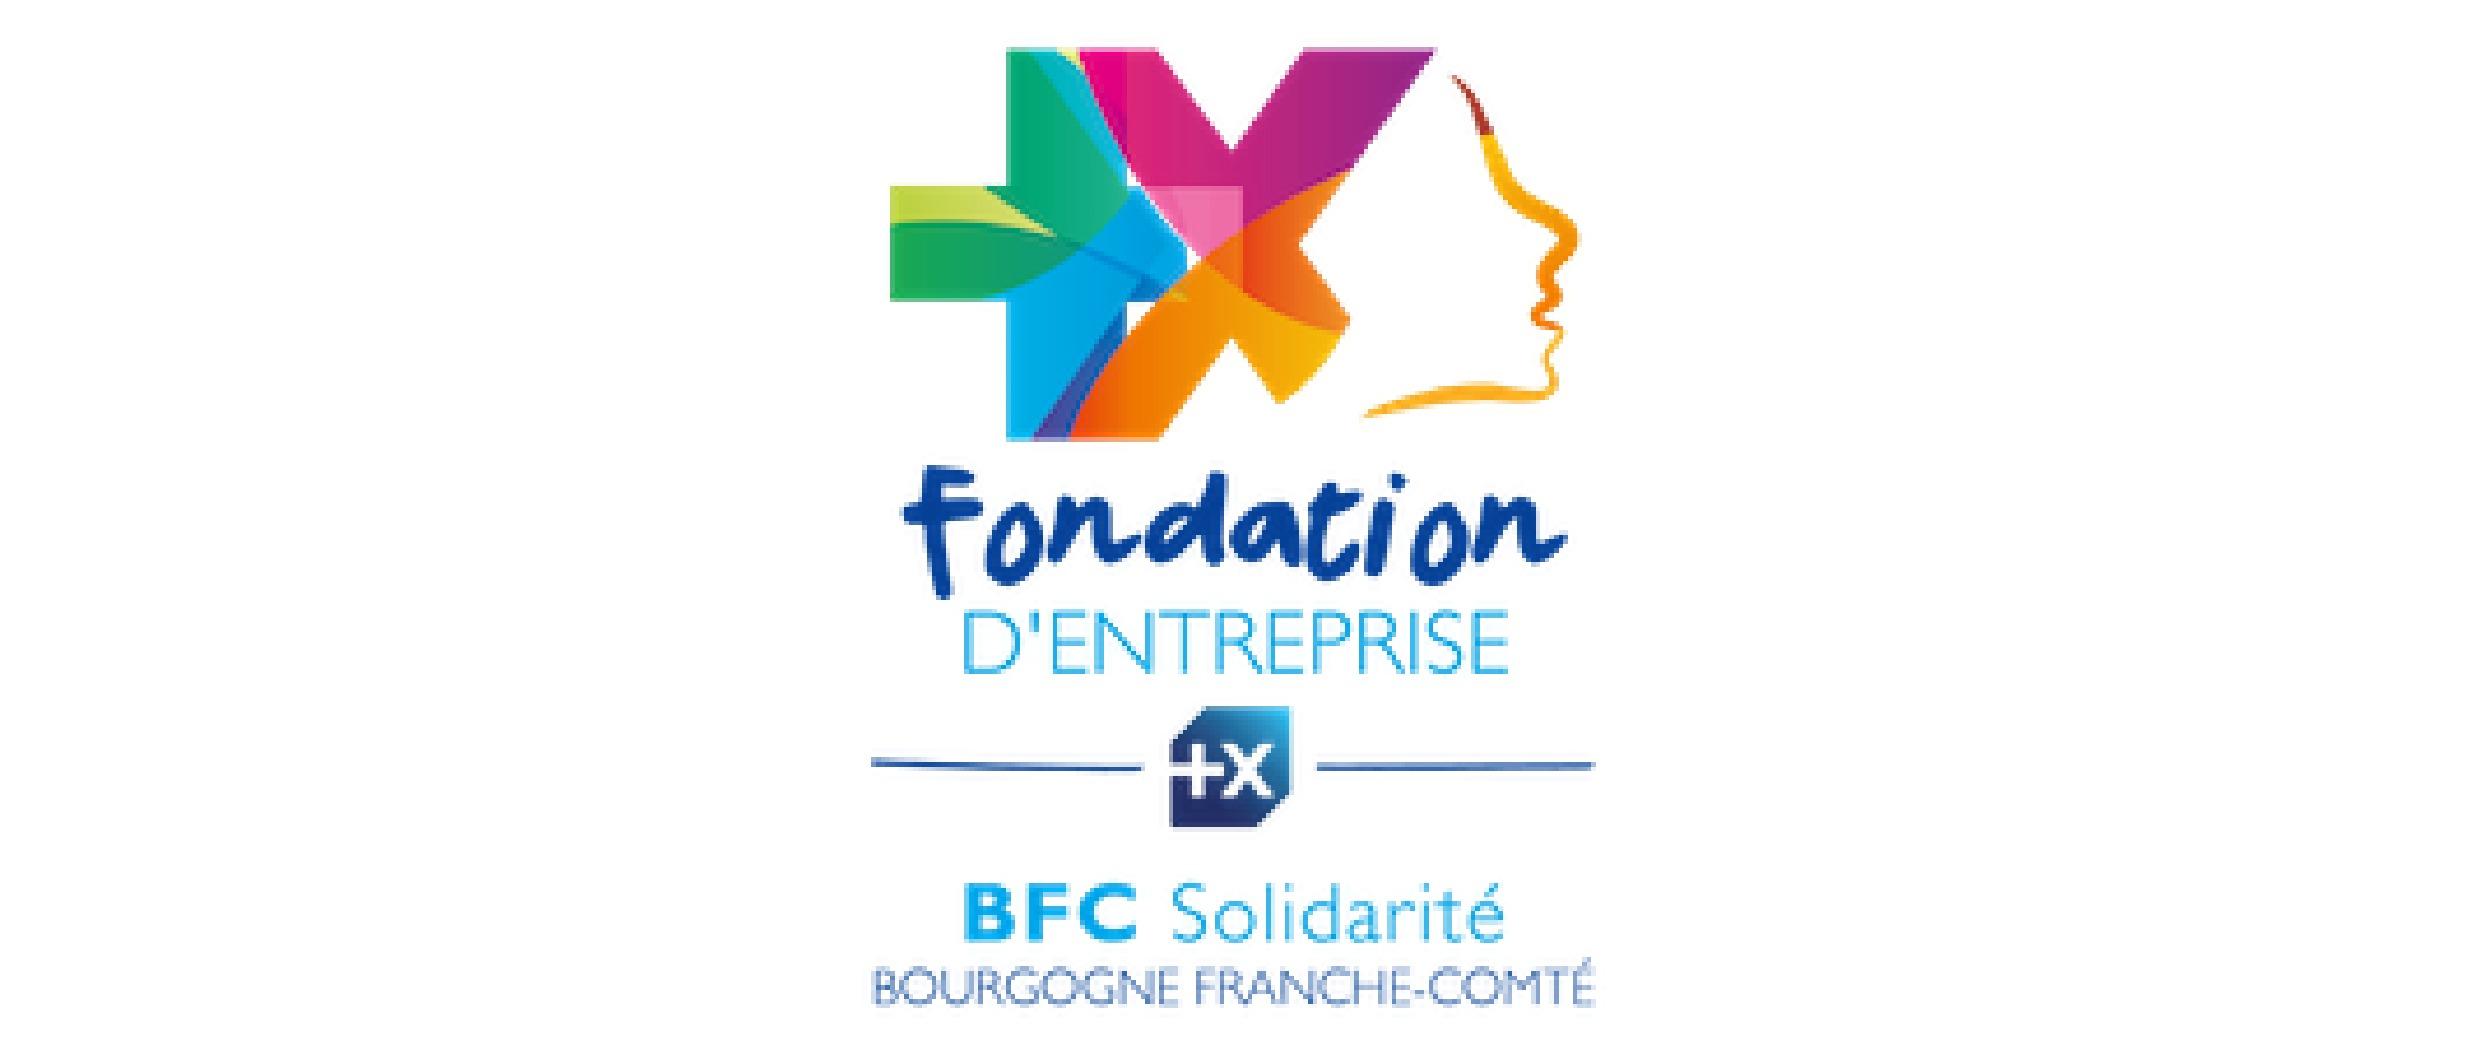 Fondation BFC